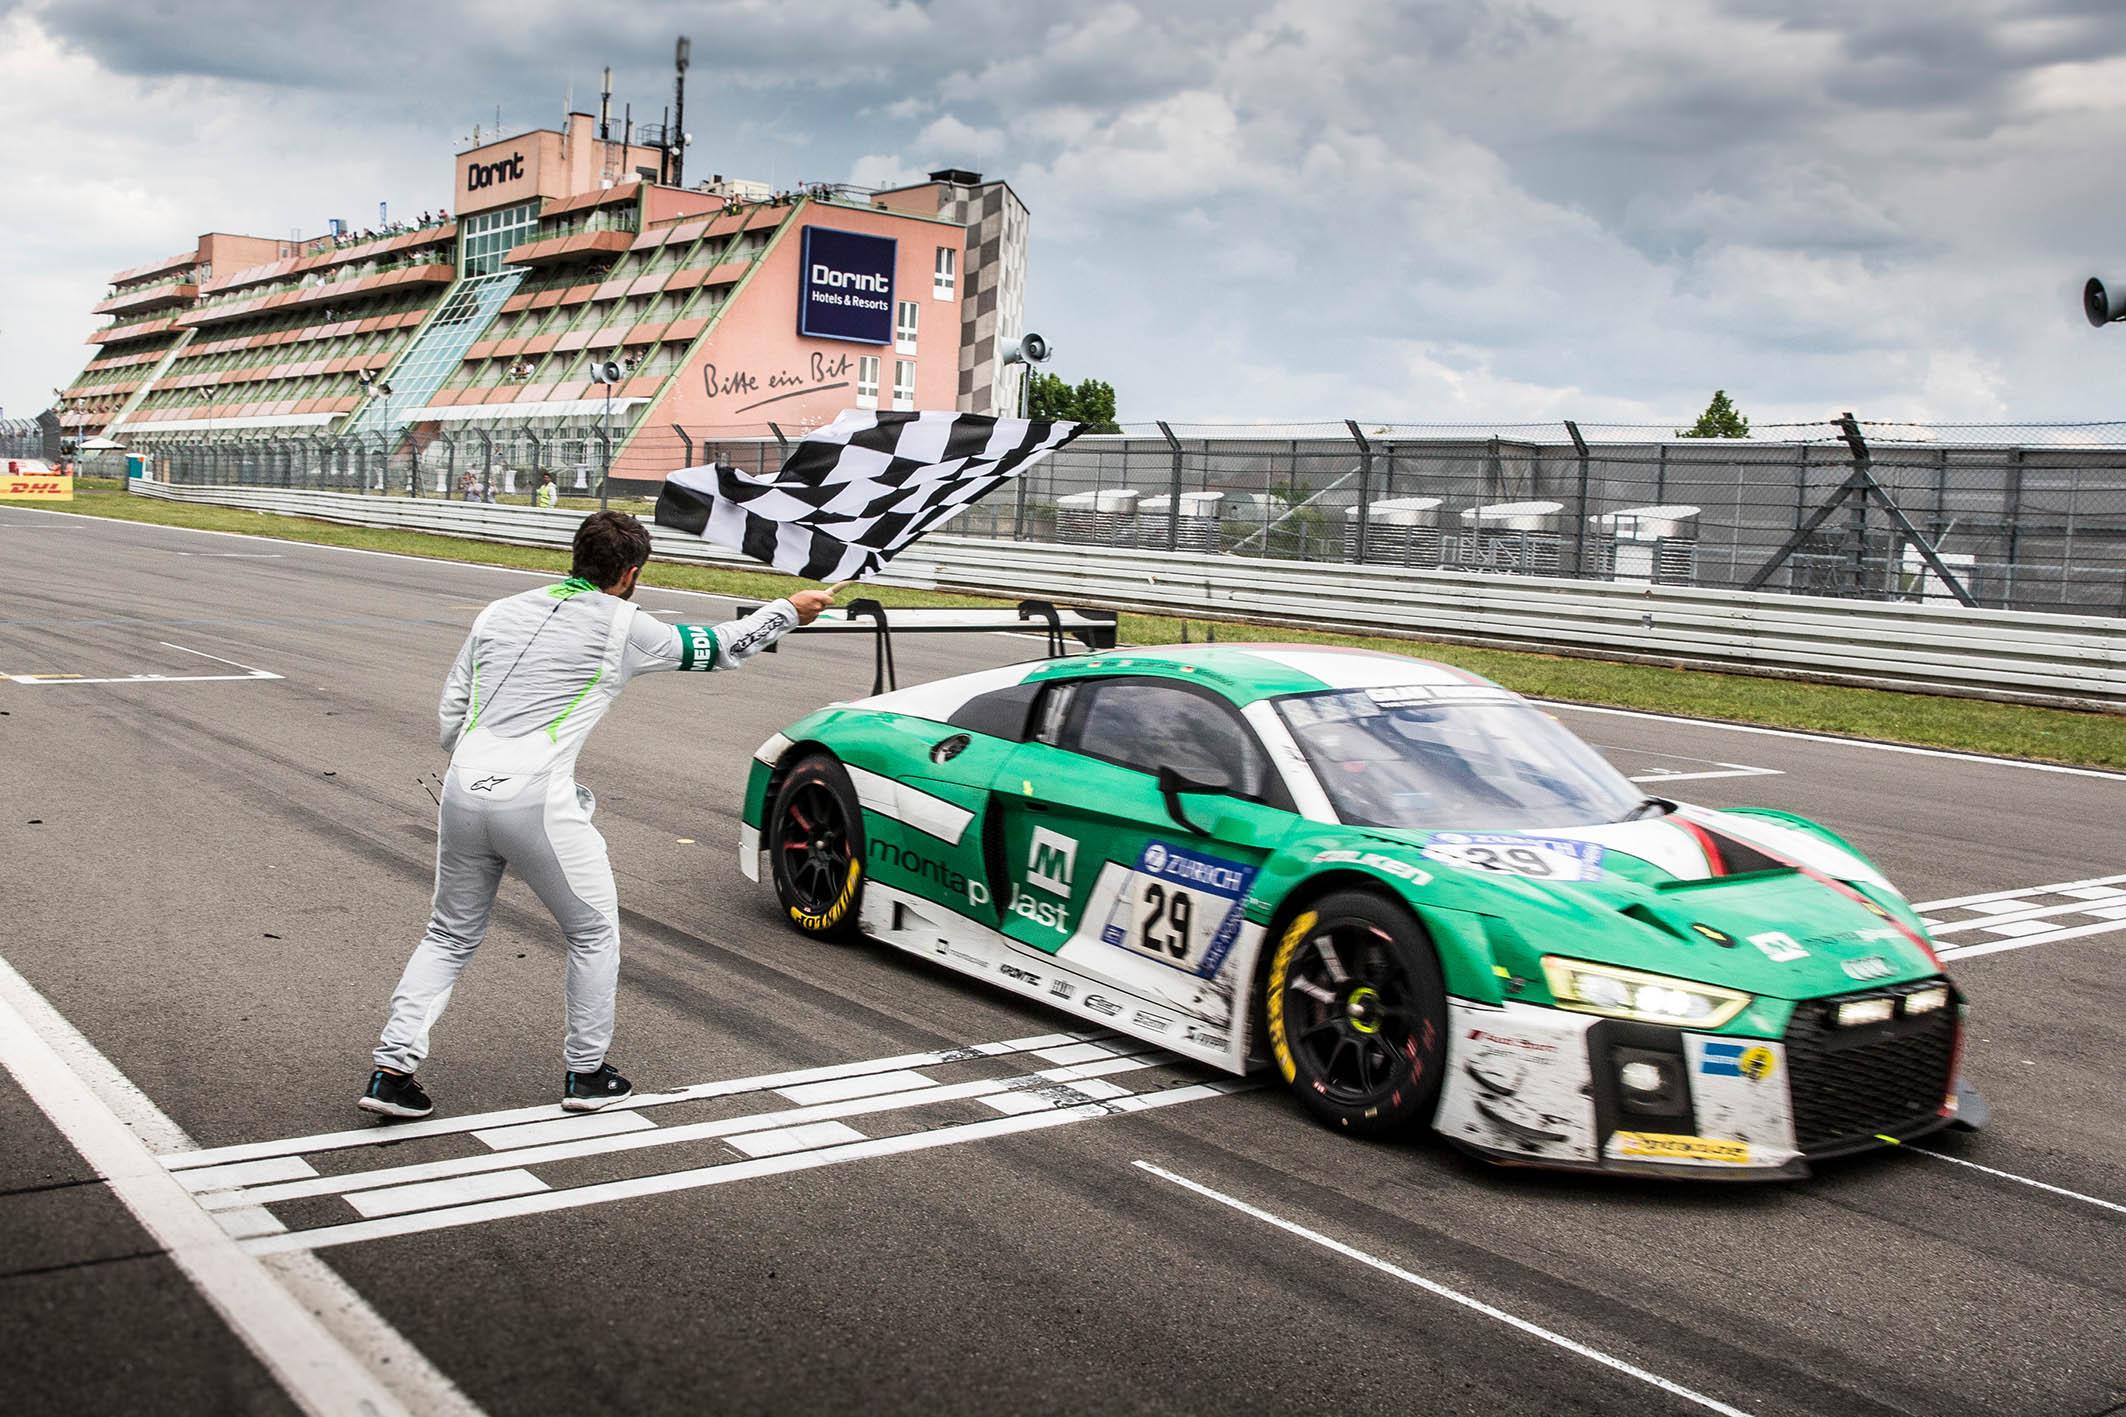 Land-Audi wint, Benelux-coureurs op podium inADAC Zurich 24h-Rennen Nürburgring